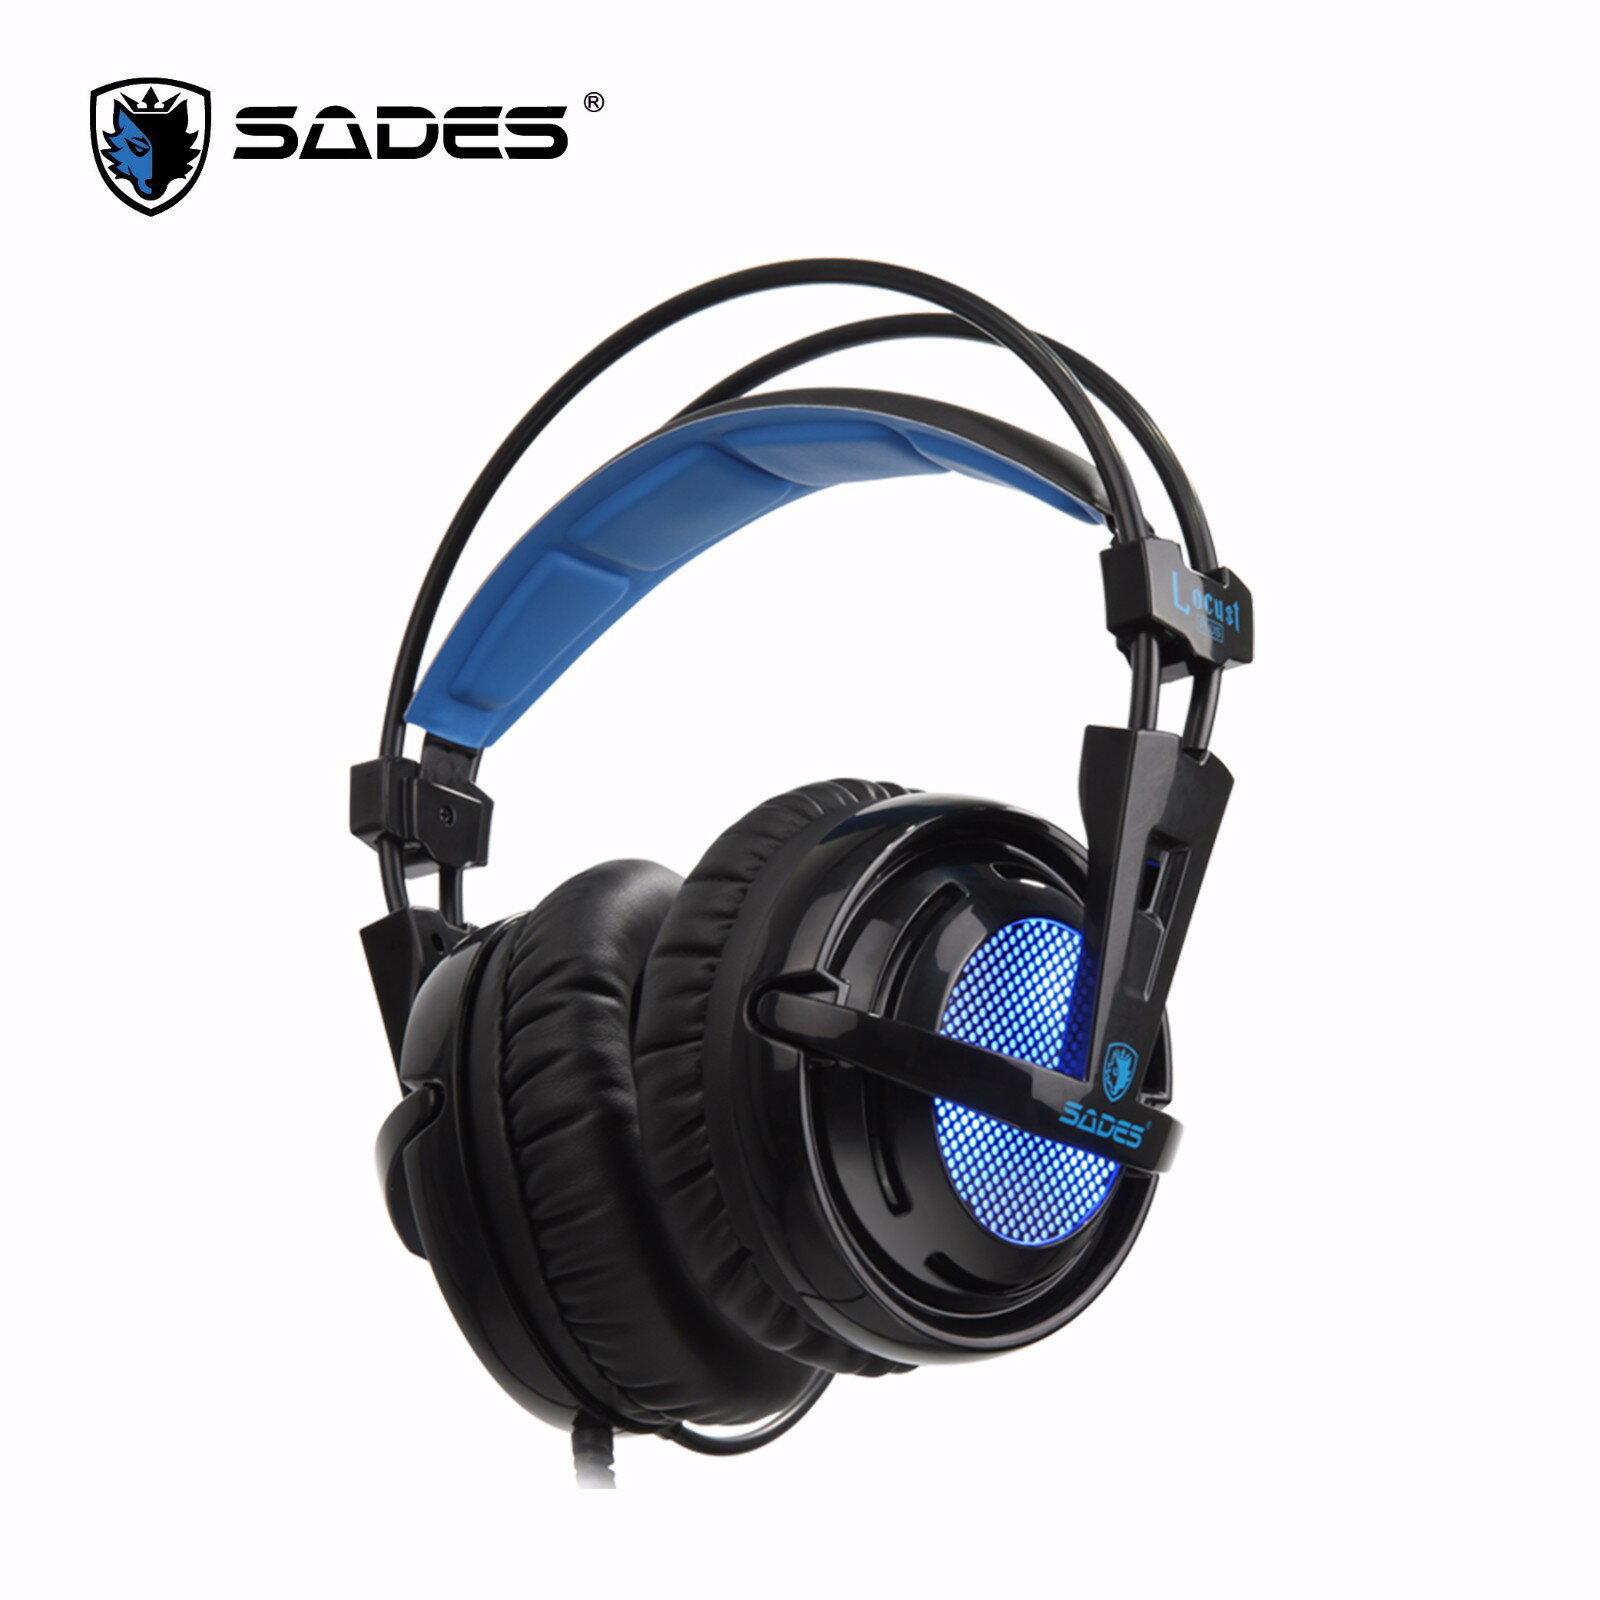 SADES 賽德斯 Locust Plus 狼蝗SA-904S RGB電競耳麥 7.1聲道 RGB燈效 遊戲耳麥【迪特軍3C】